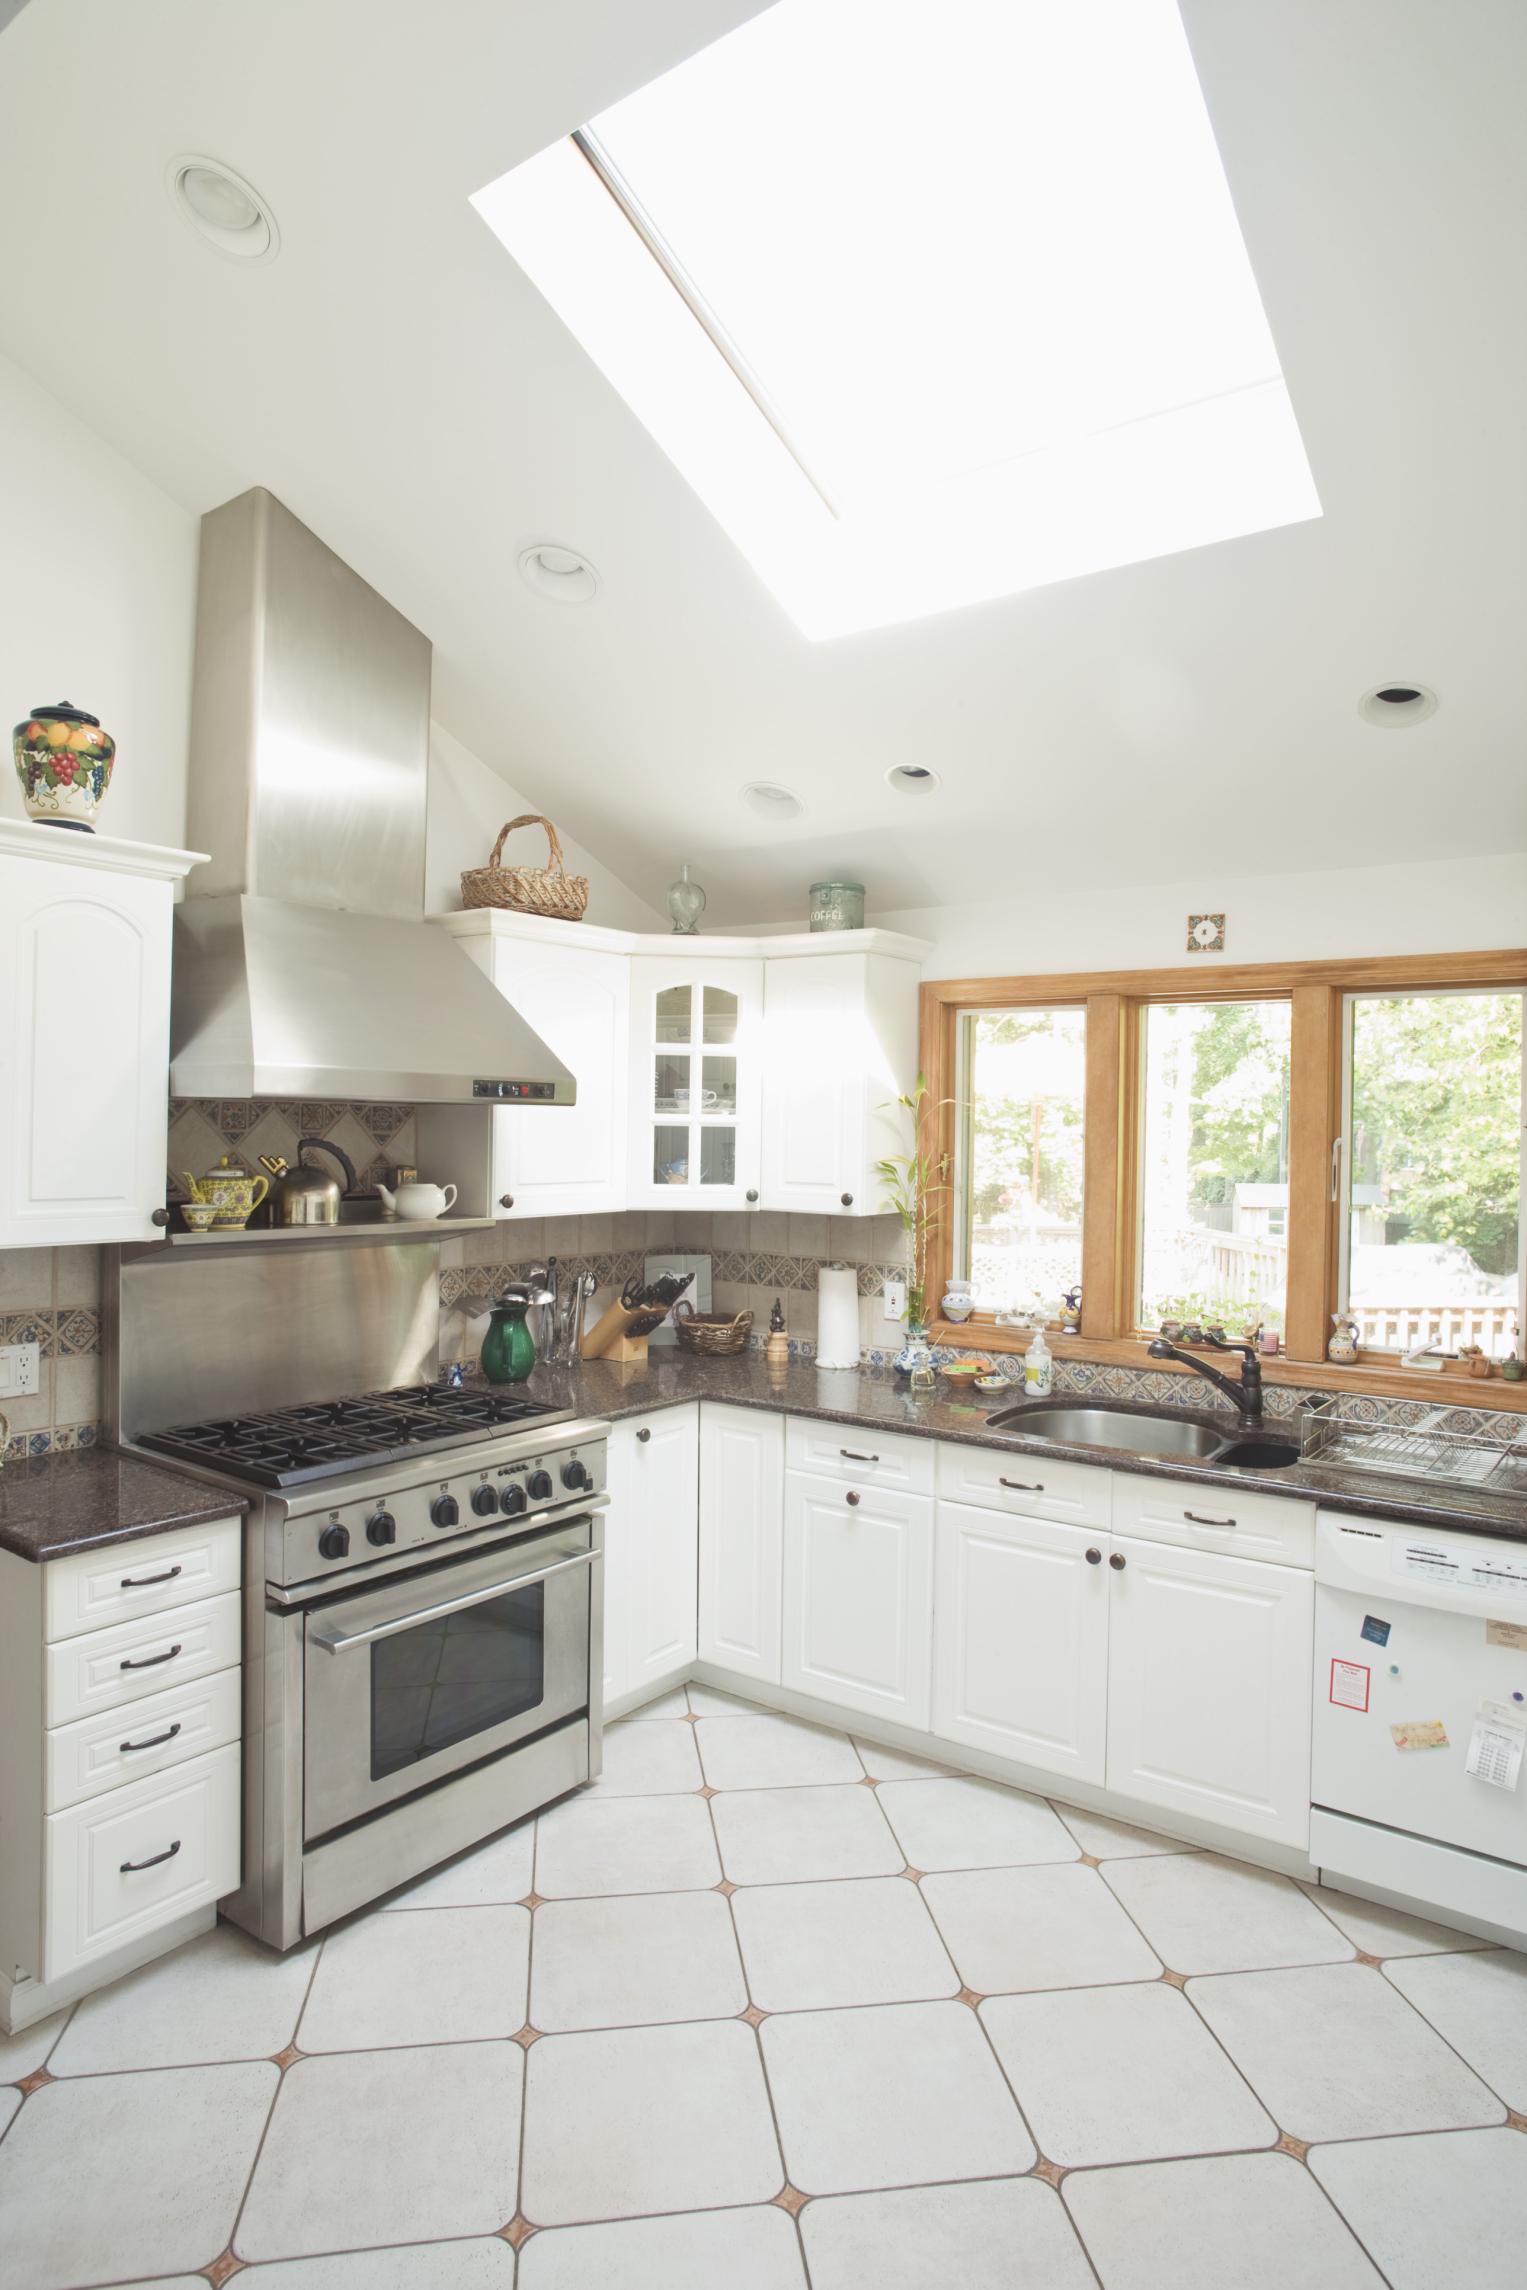 1980s White Melamine Kitchen Cabinets With The Oak Trim ...